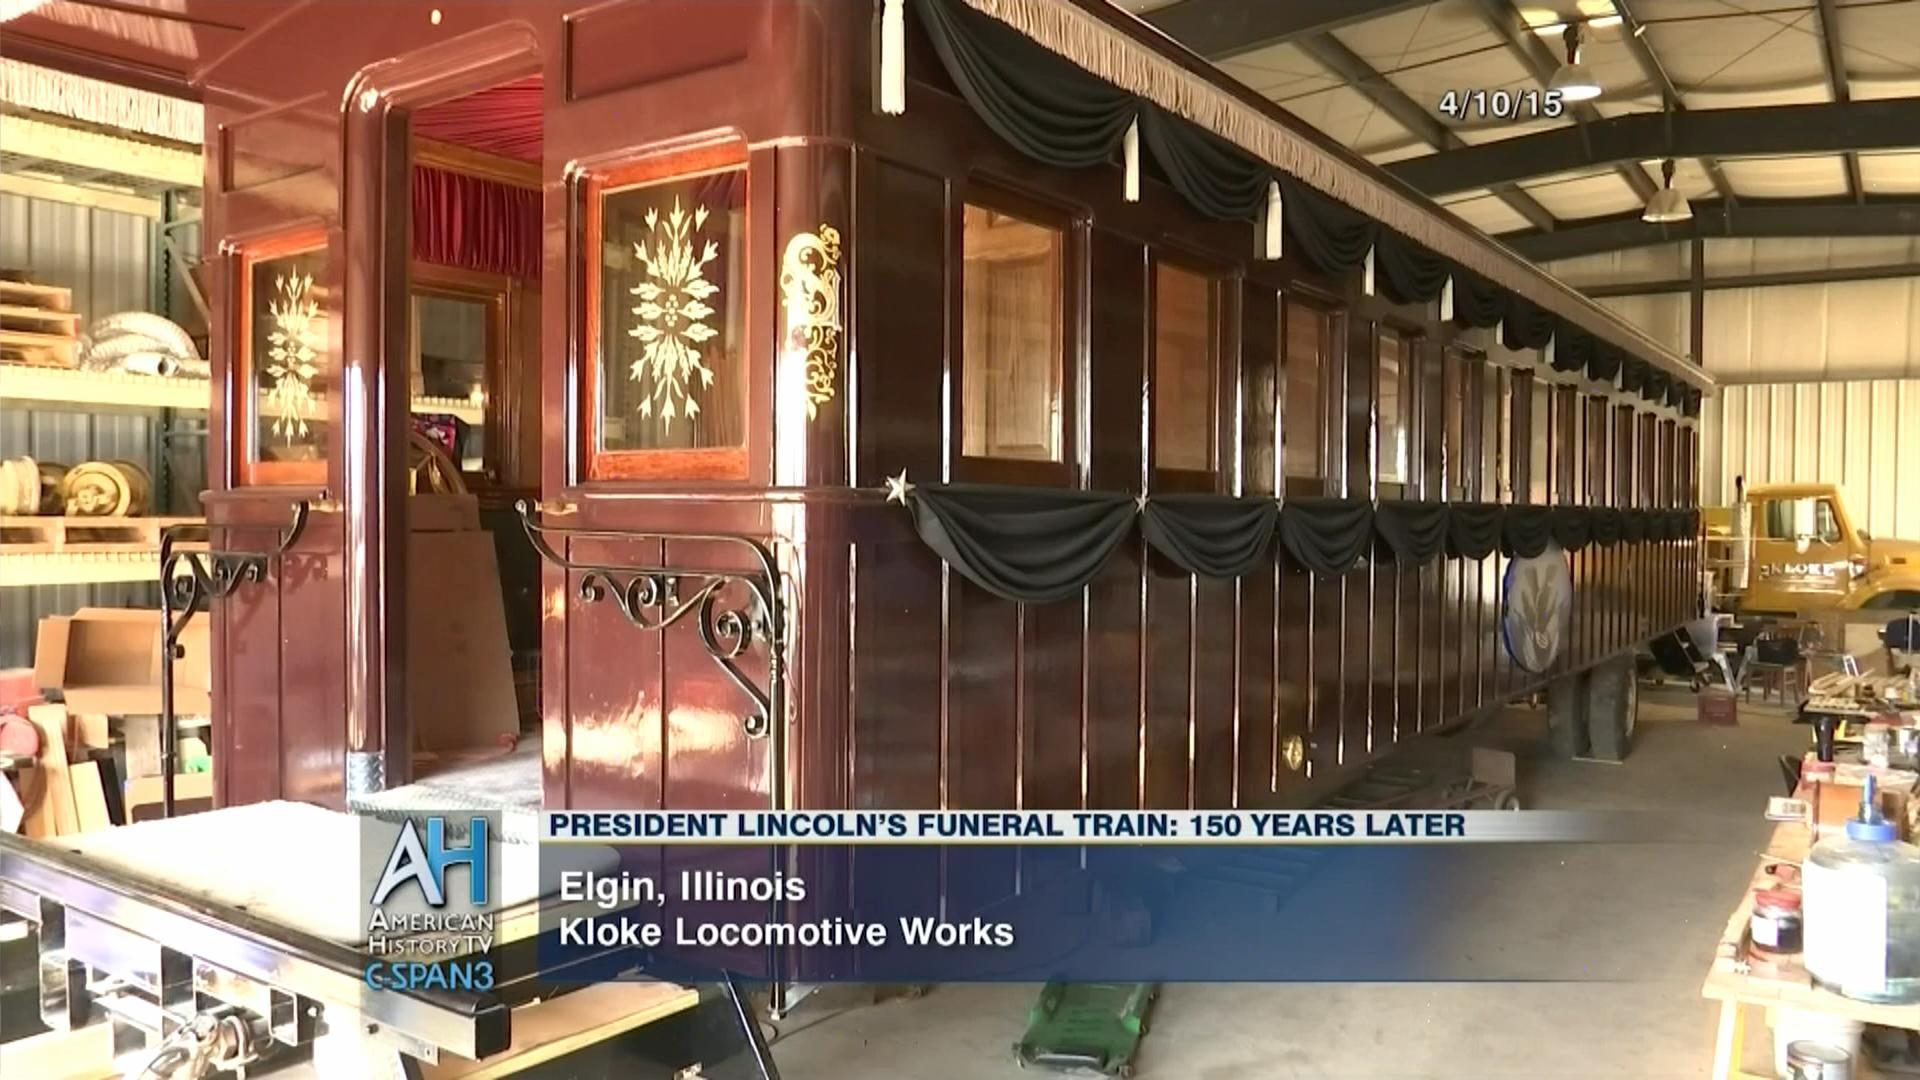 Lincoln Funeral Train Car Replica Apr 10 2015 Video C Span Org